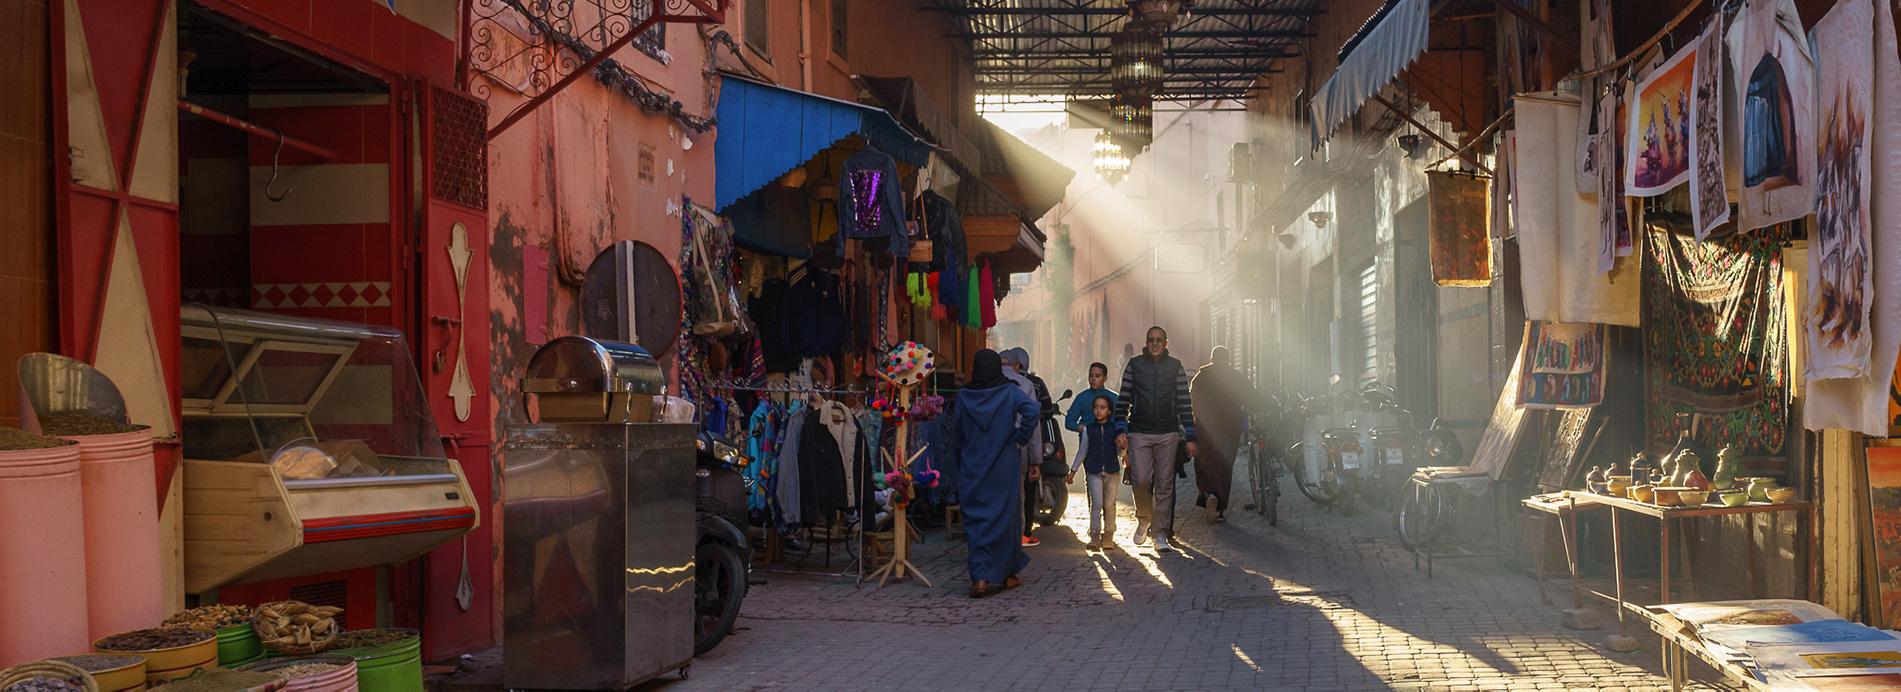 Reisebericht Marrakesch Marokko